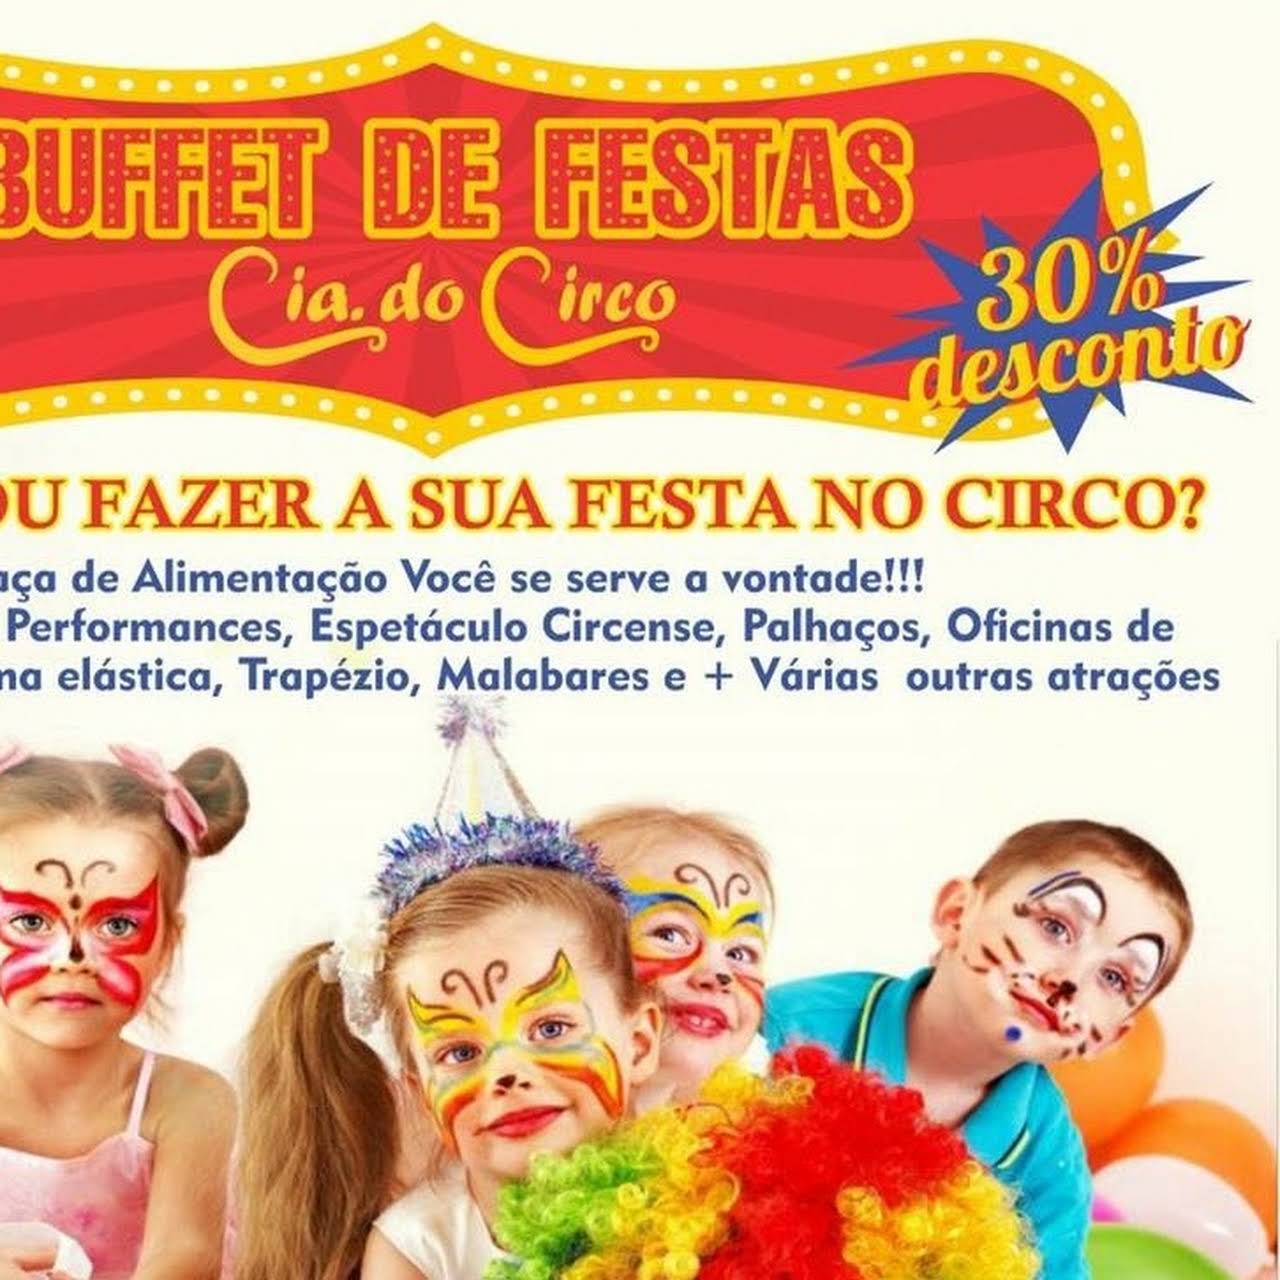 Awe Inspiring Cia Do Circo Escola De Circo Buffet De Festas Academia Home Interior And Landscaping Spoatsignezvosmurscom